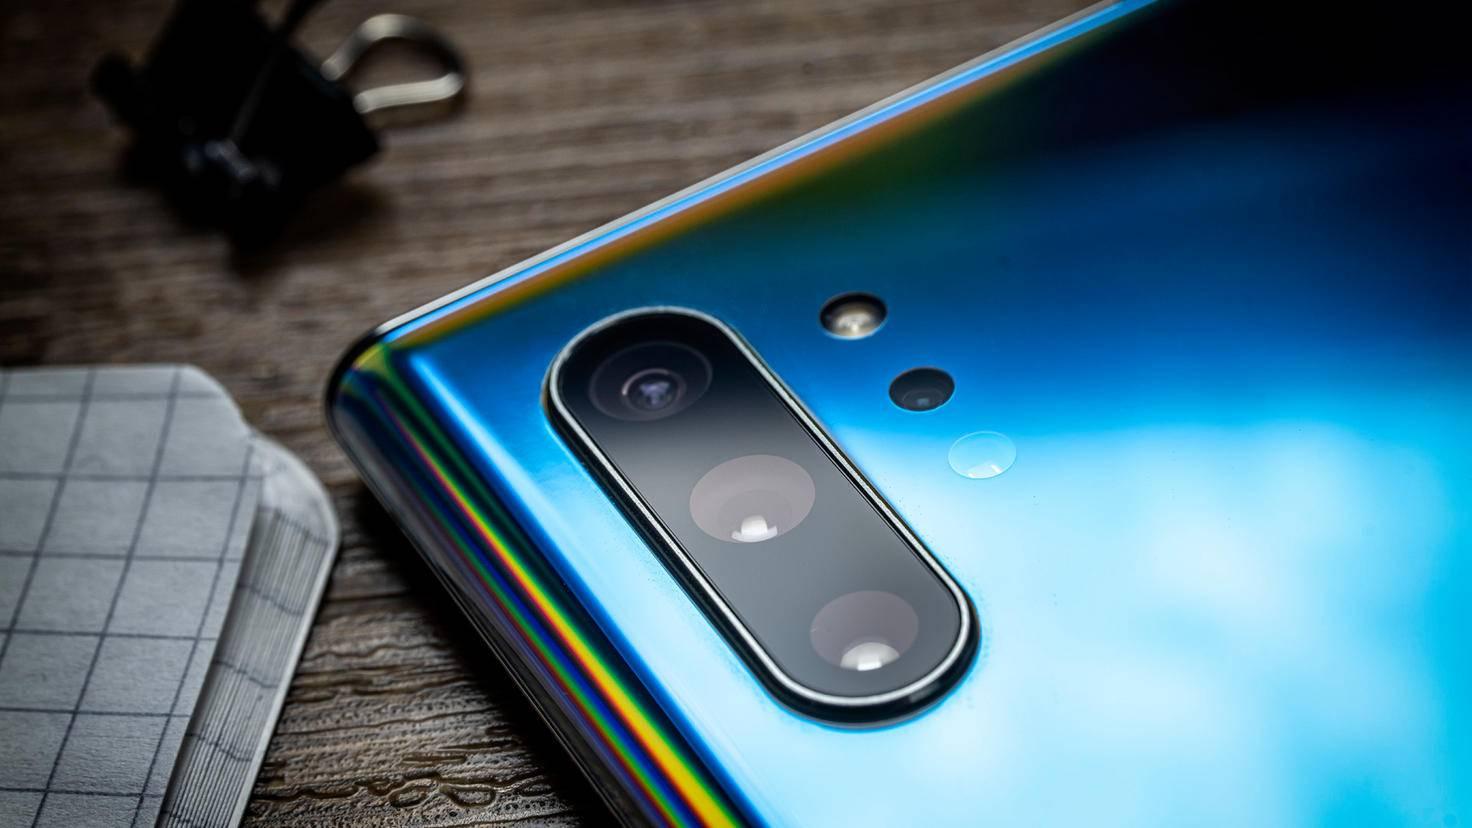 Galaxy Note 10 Plus Kamera